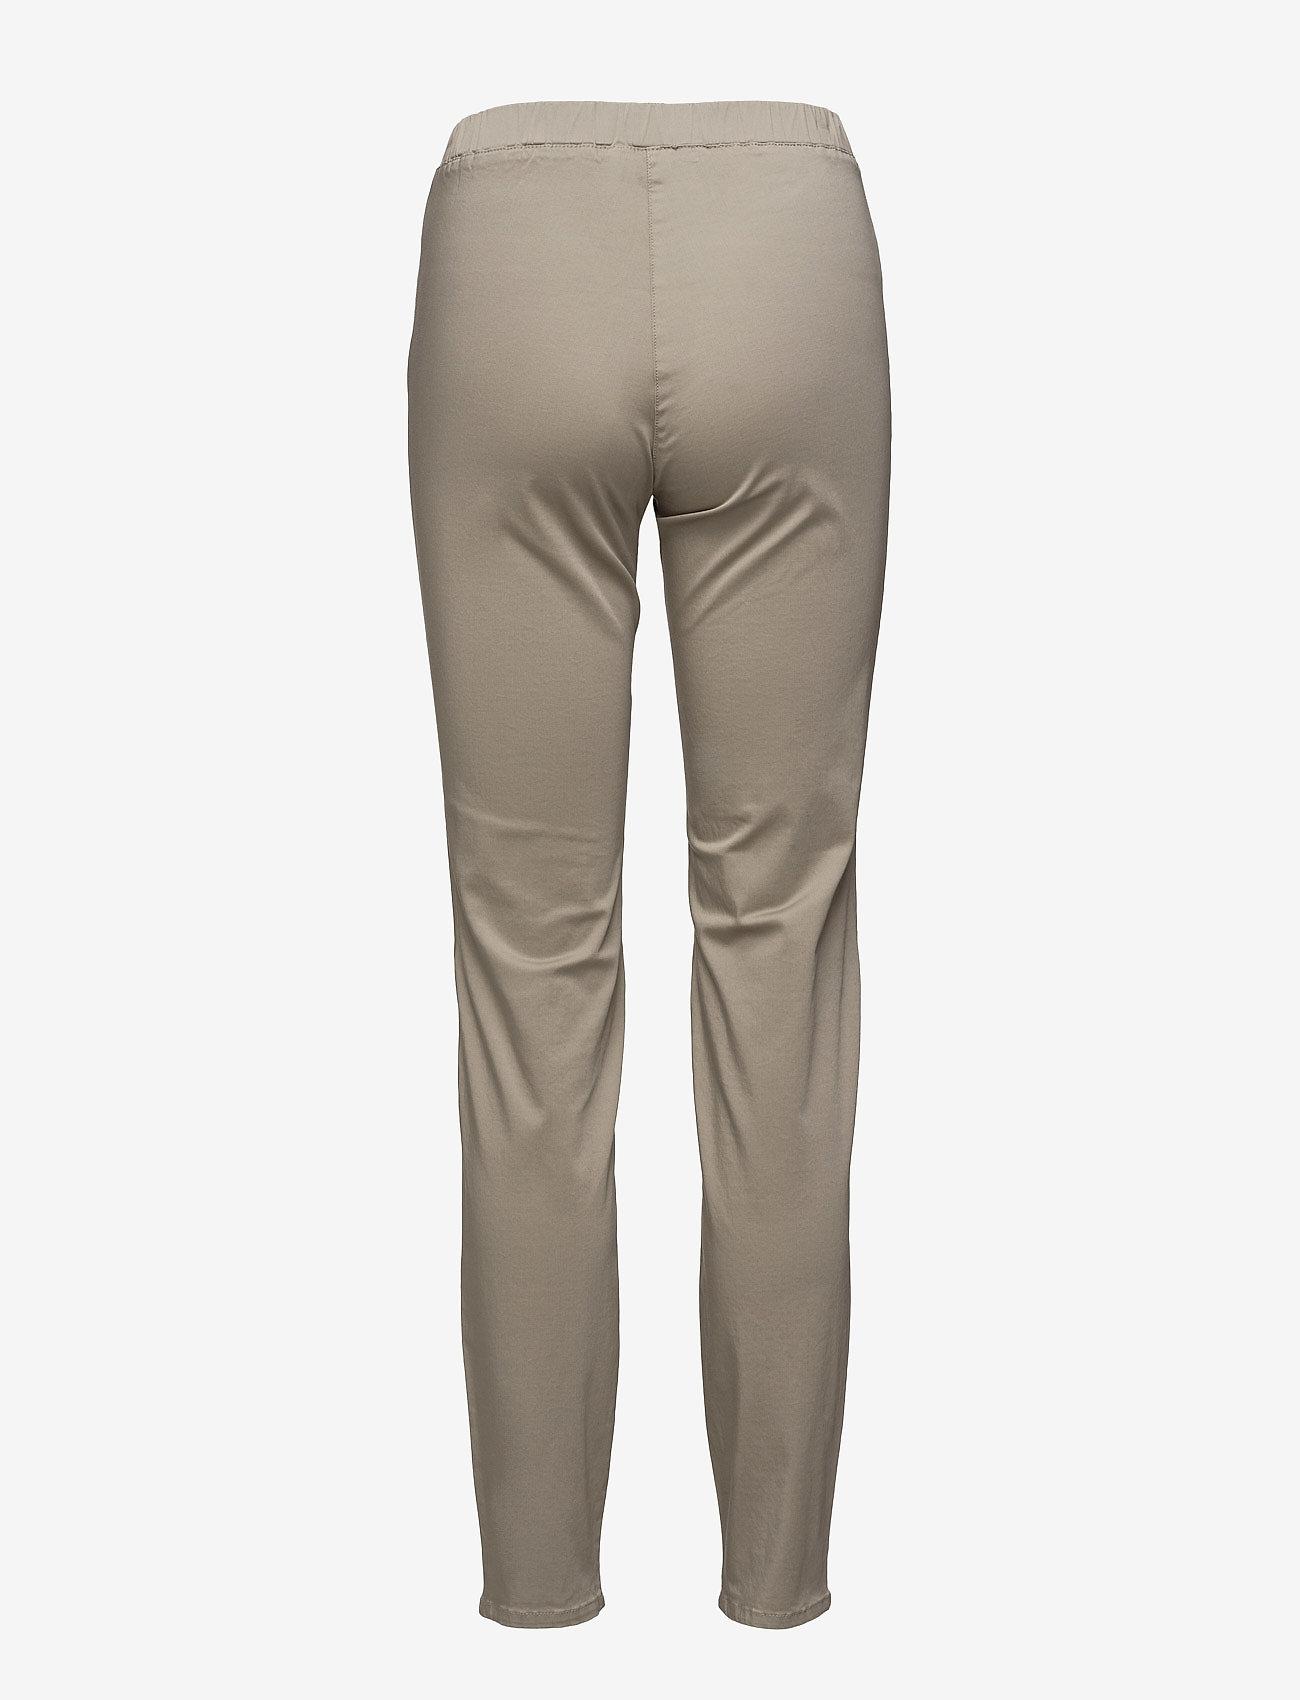 Masai Primitiva Trousers Ew Basic - Byxor Khaki